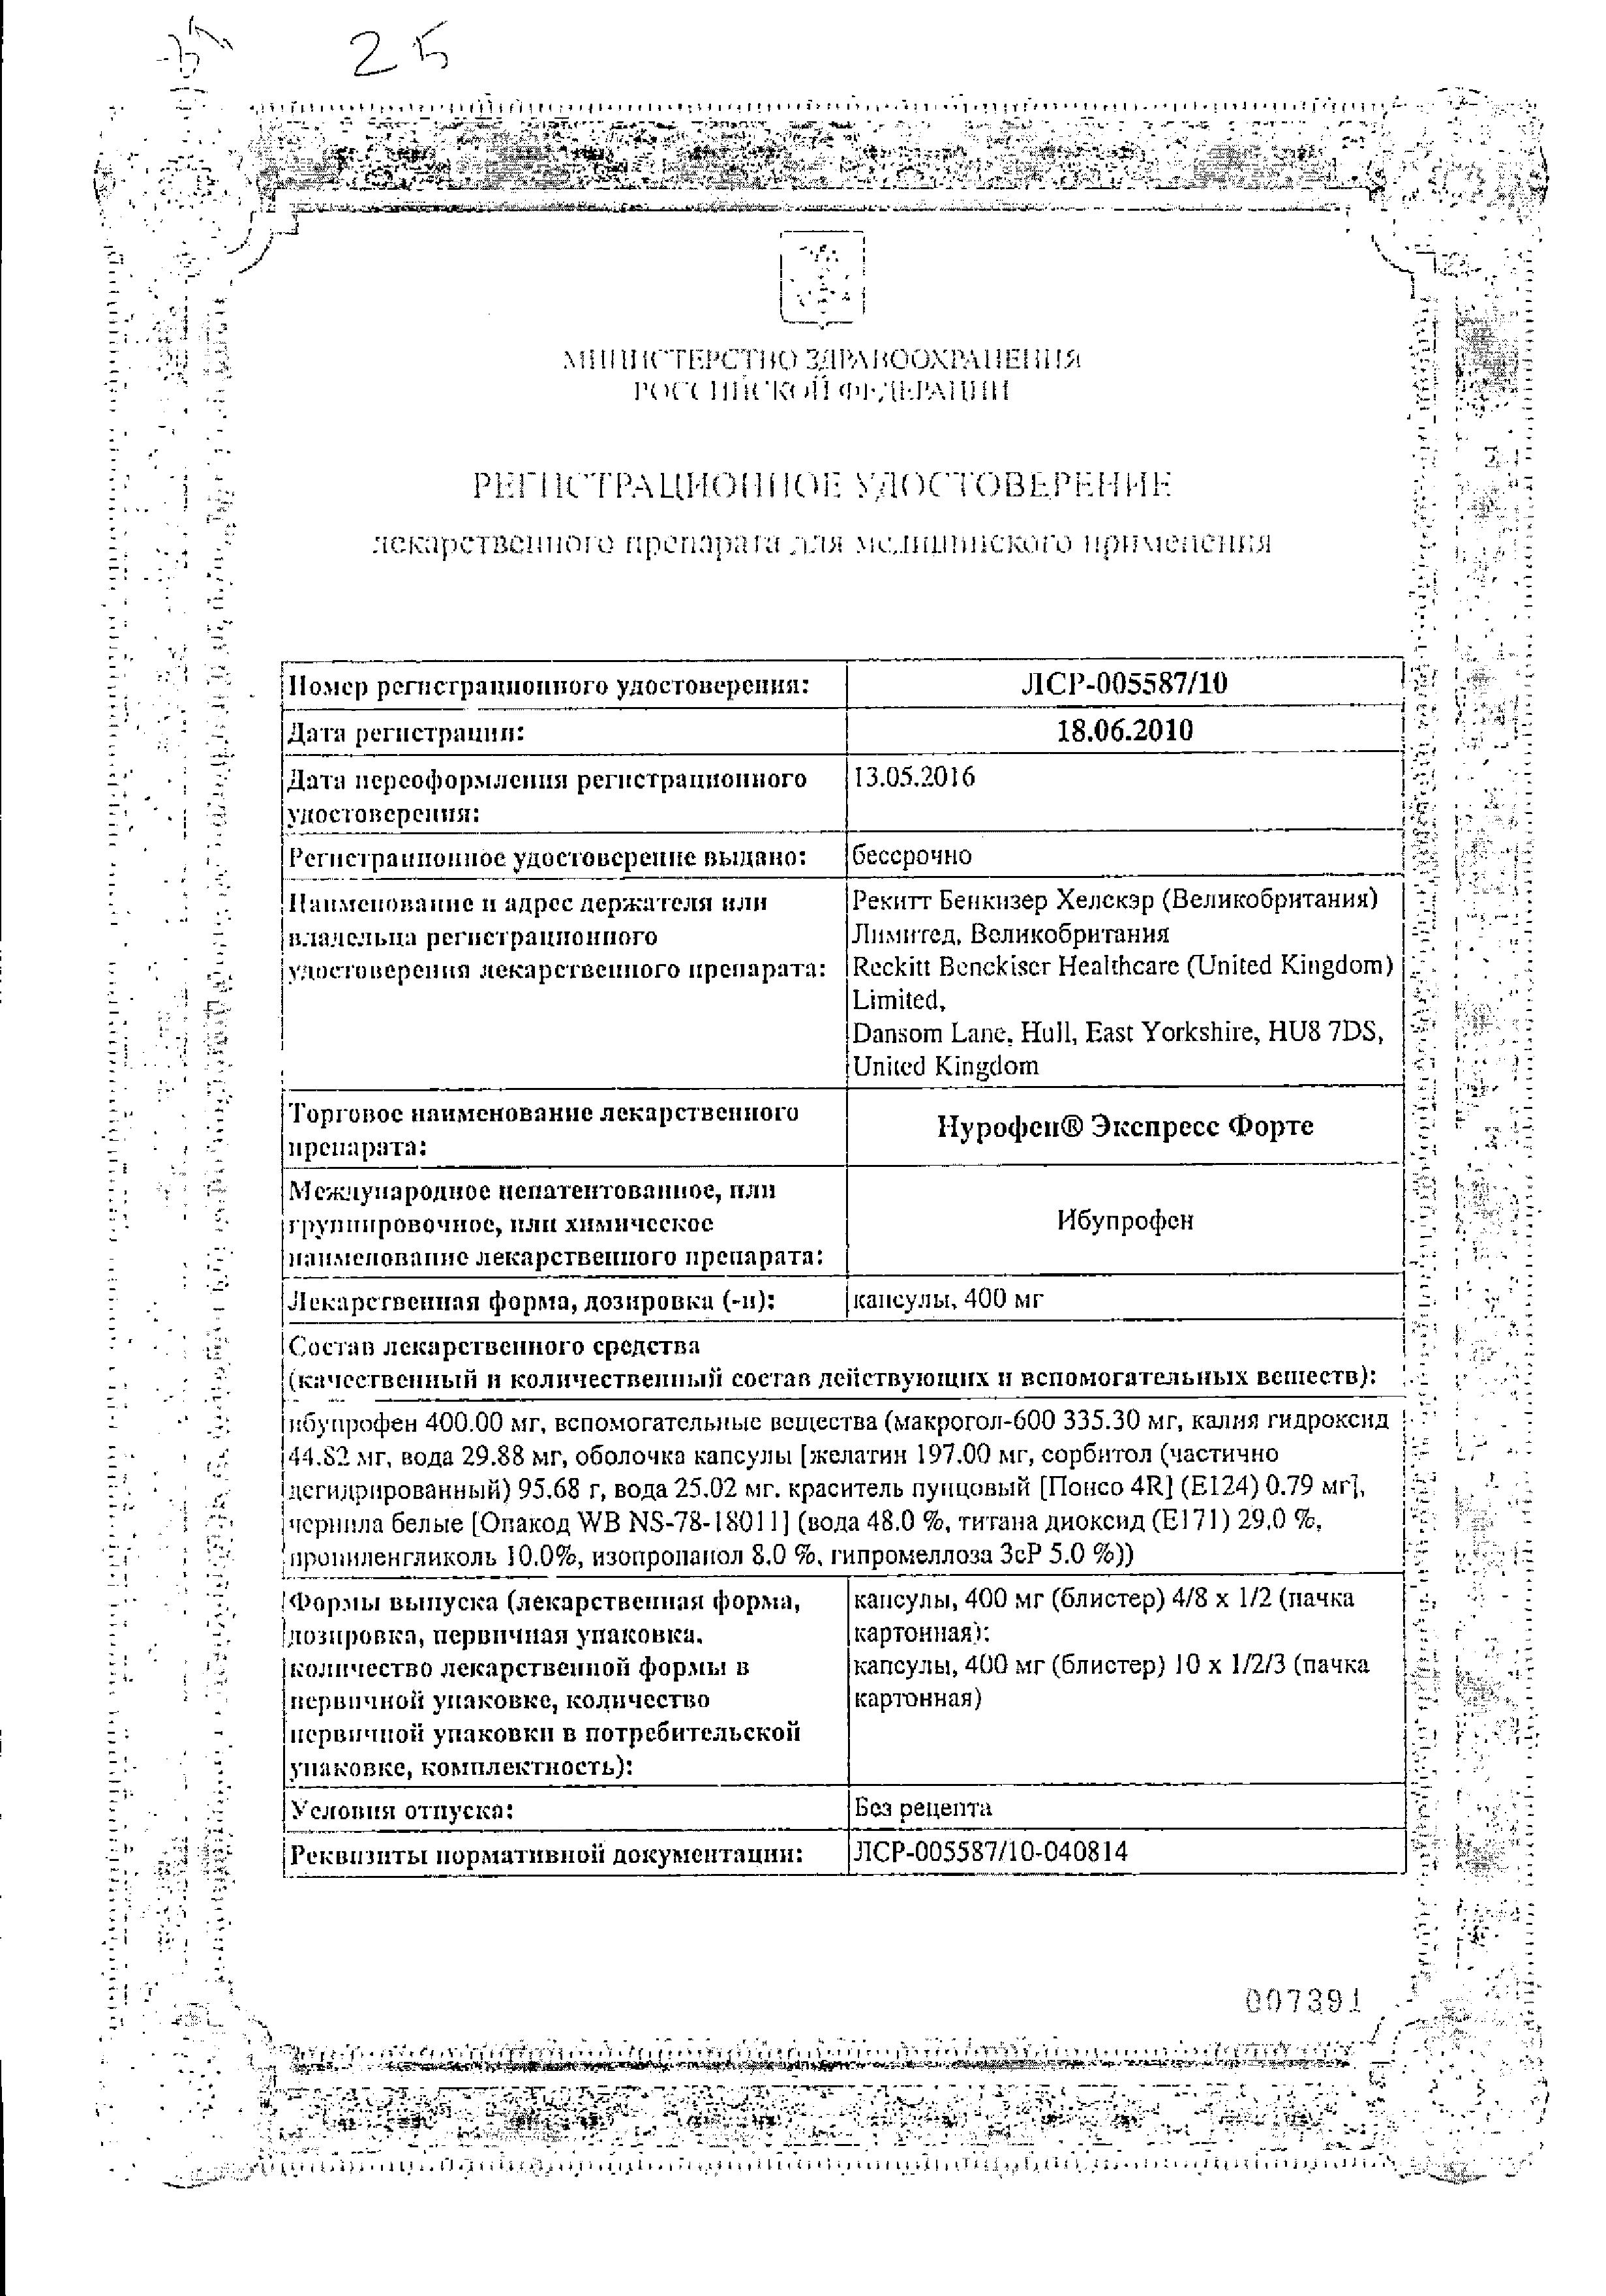 Нурофен Экспресс форте сертификат